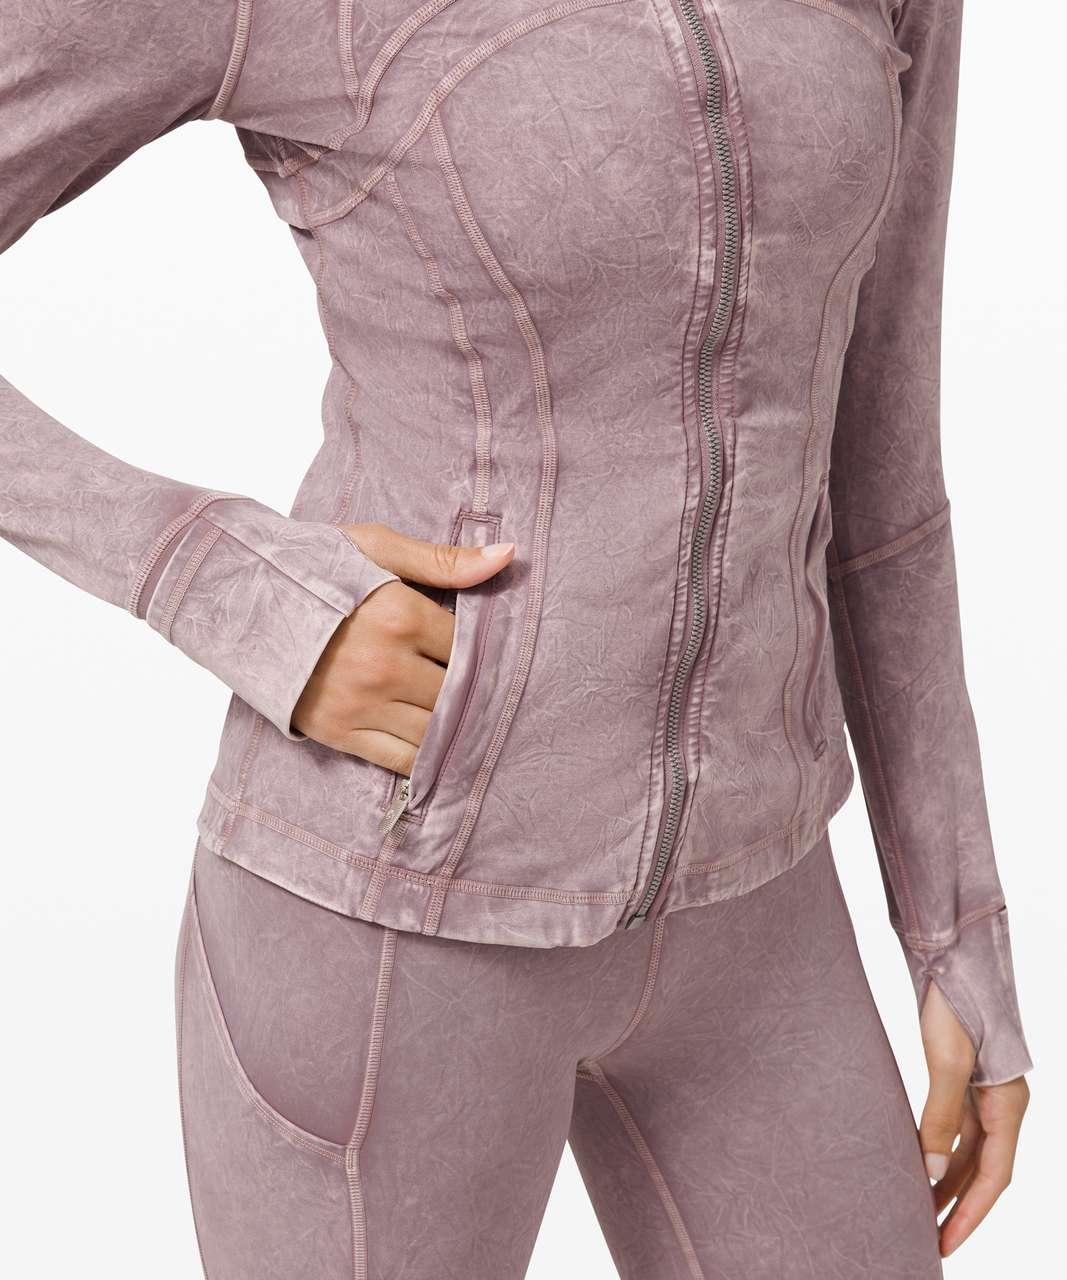 Lululemon Define Jacket *Ice Dye - Ice Wash Violet Verbena